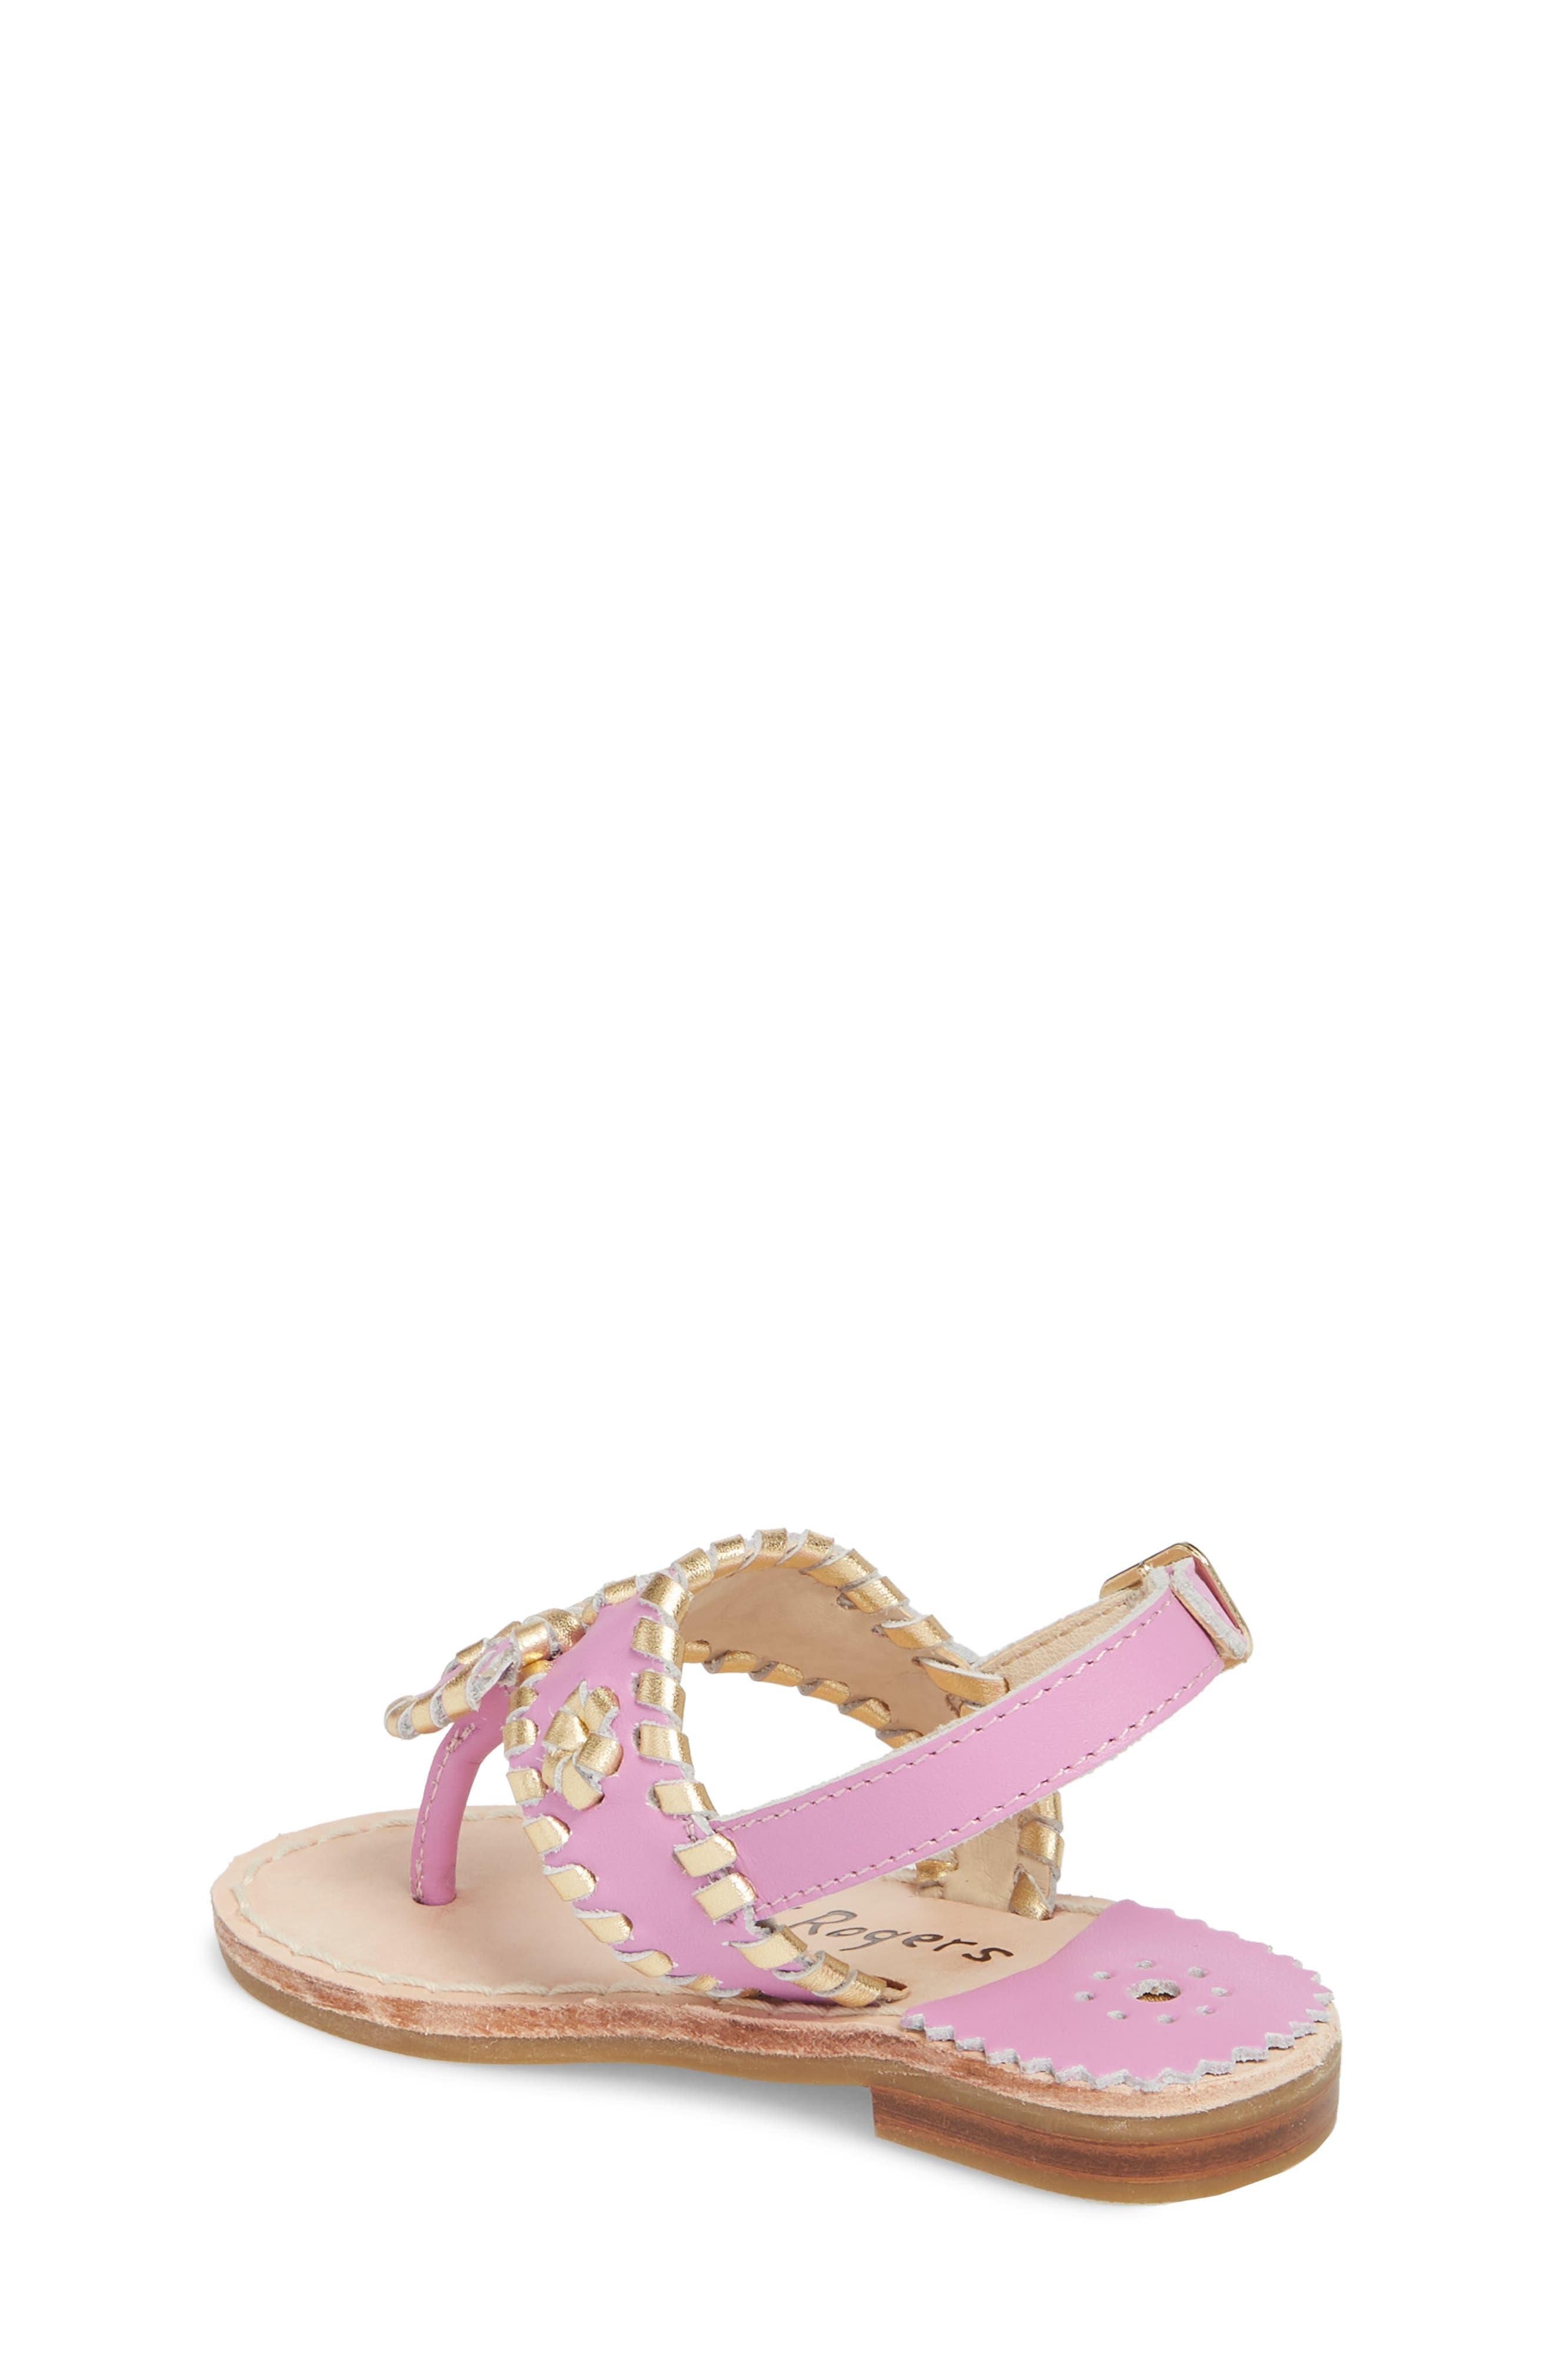 Little Miss Hollis Metallic Trim Sandal,                             Alternate thumbnail 2, color,                             Lavender Pink/ Gold Leather